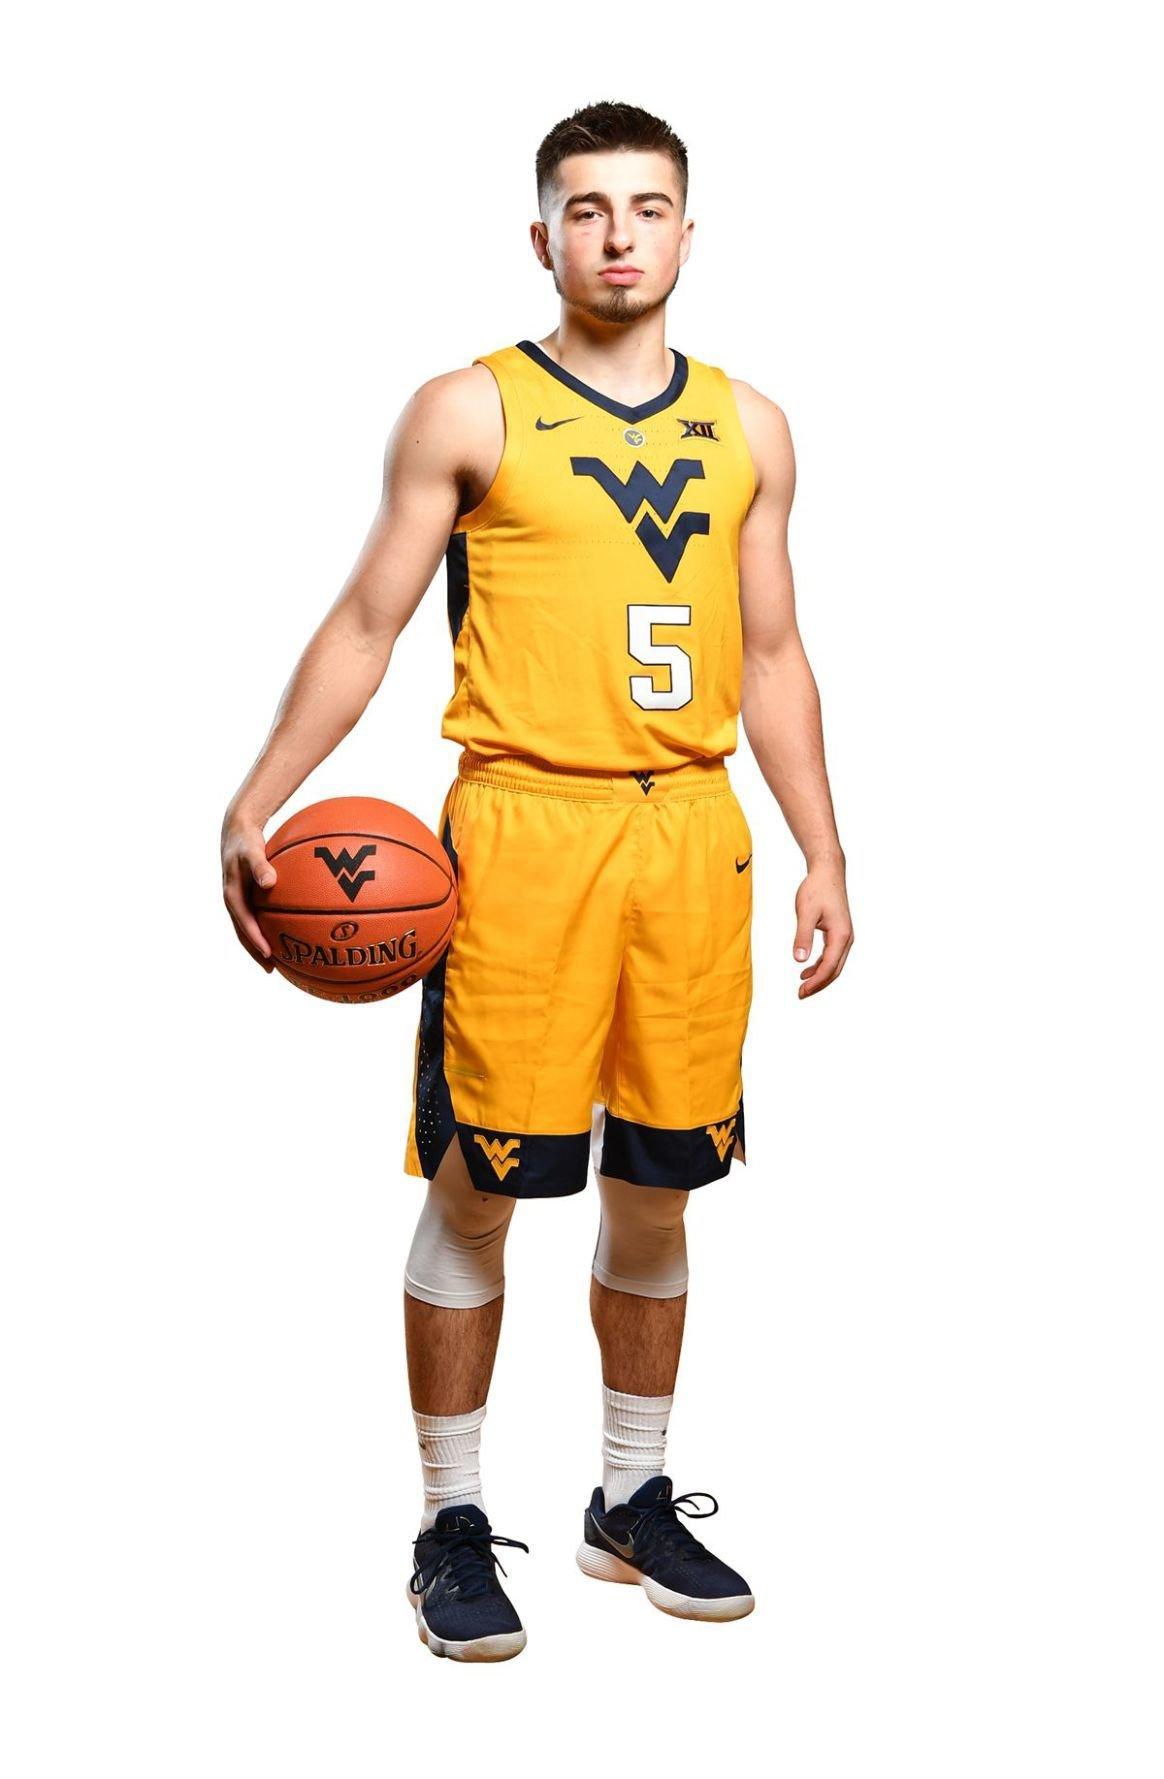 549487a9636 WVU basketball: Flashy freshman Jordan McCabe ready to make ...